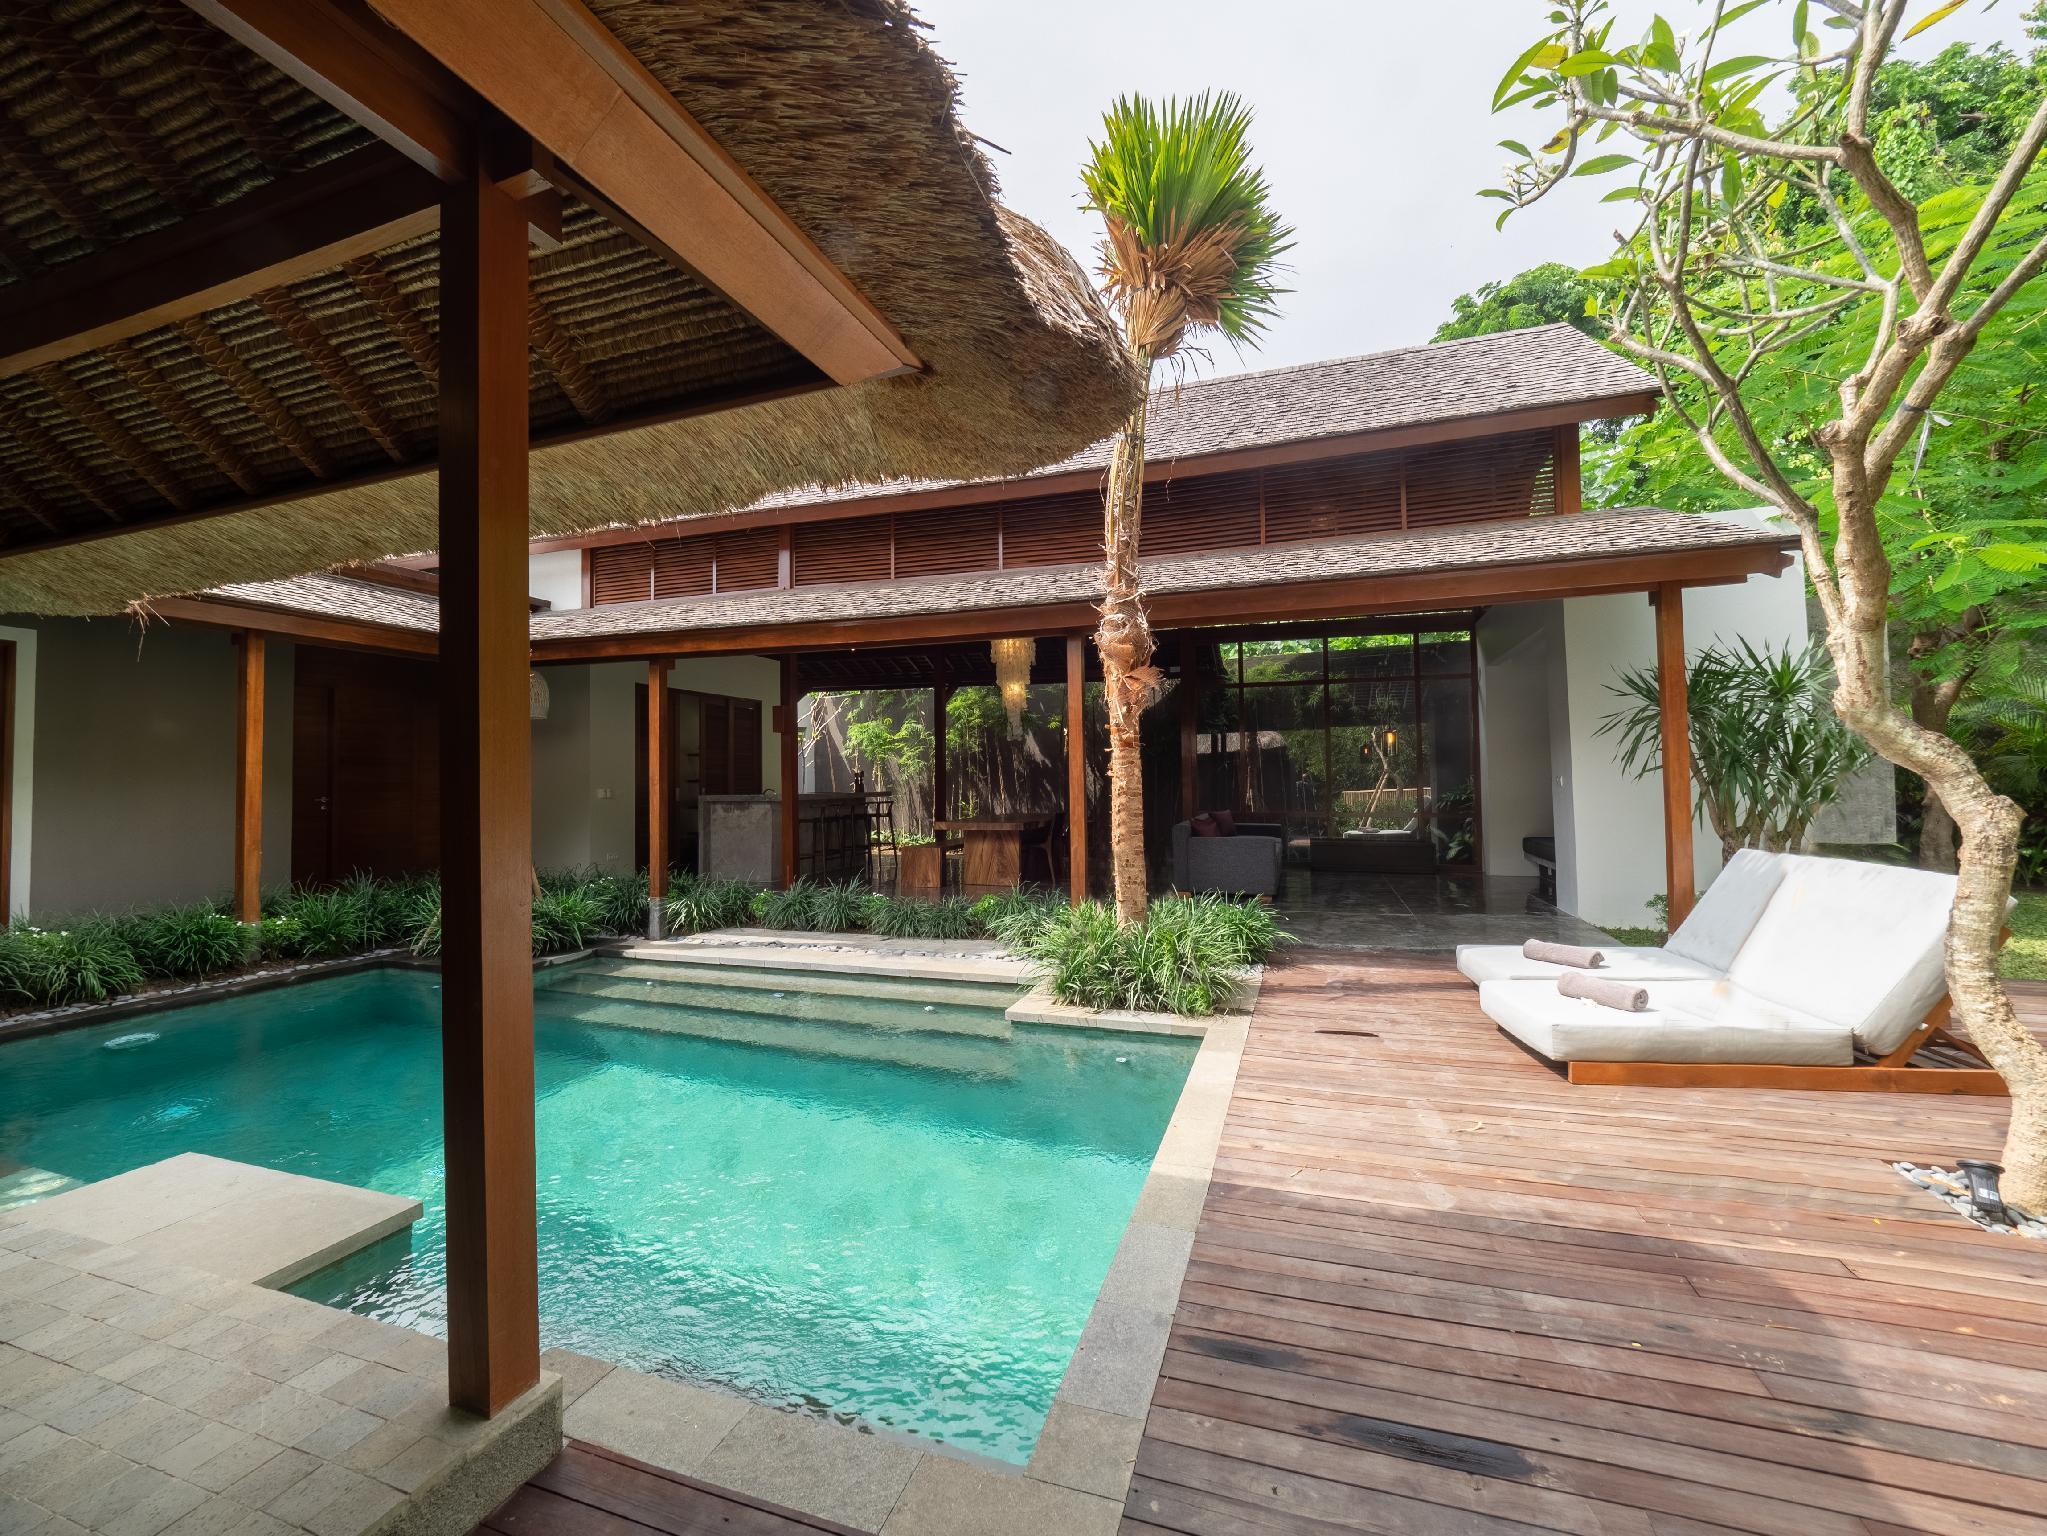 Villa Flamboyant 10 Minutes To Canggu Beach